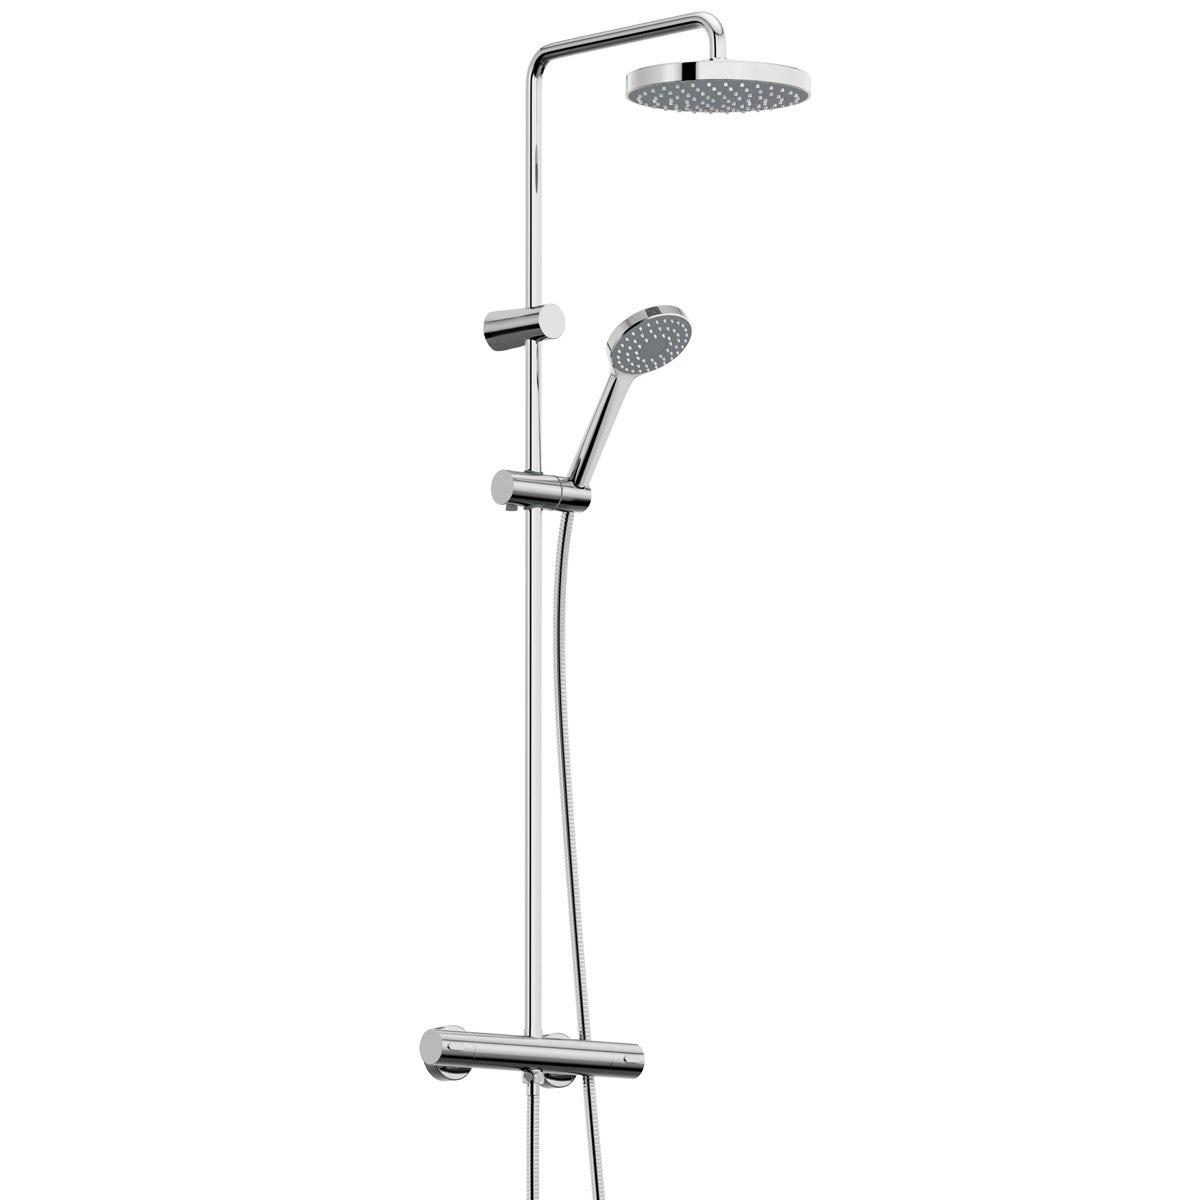 Bristan Carre thermostatic bar valve shower system